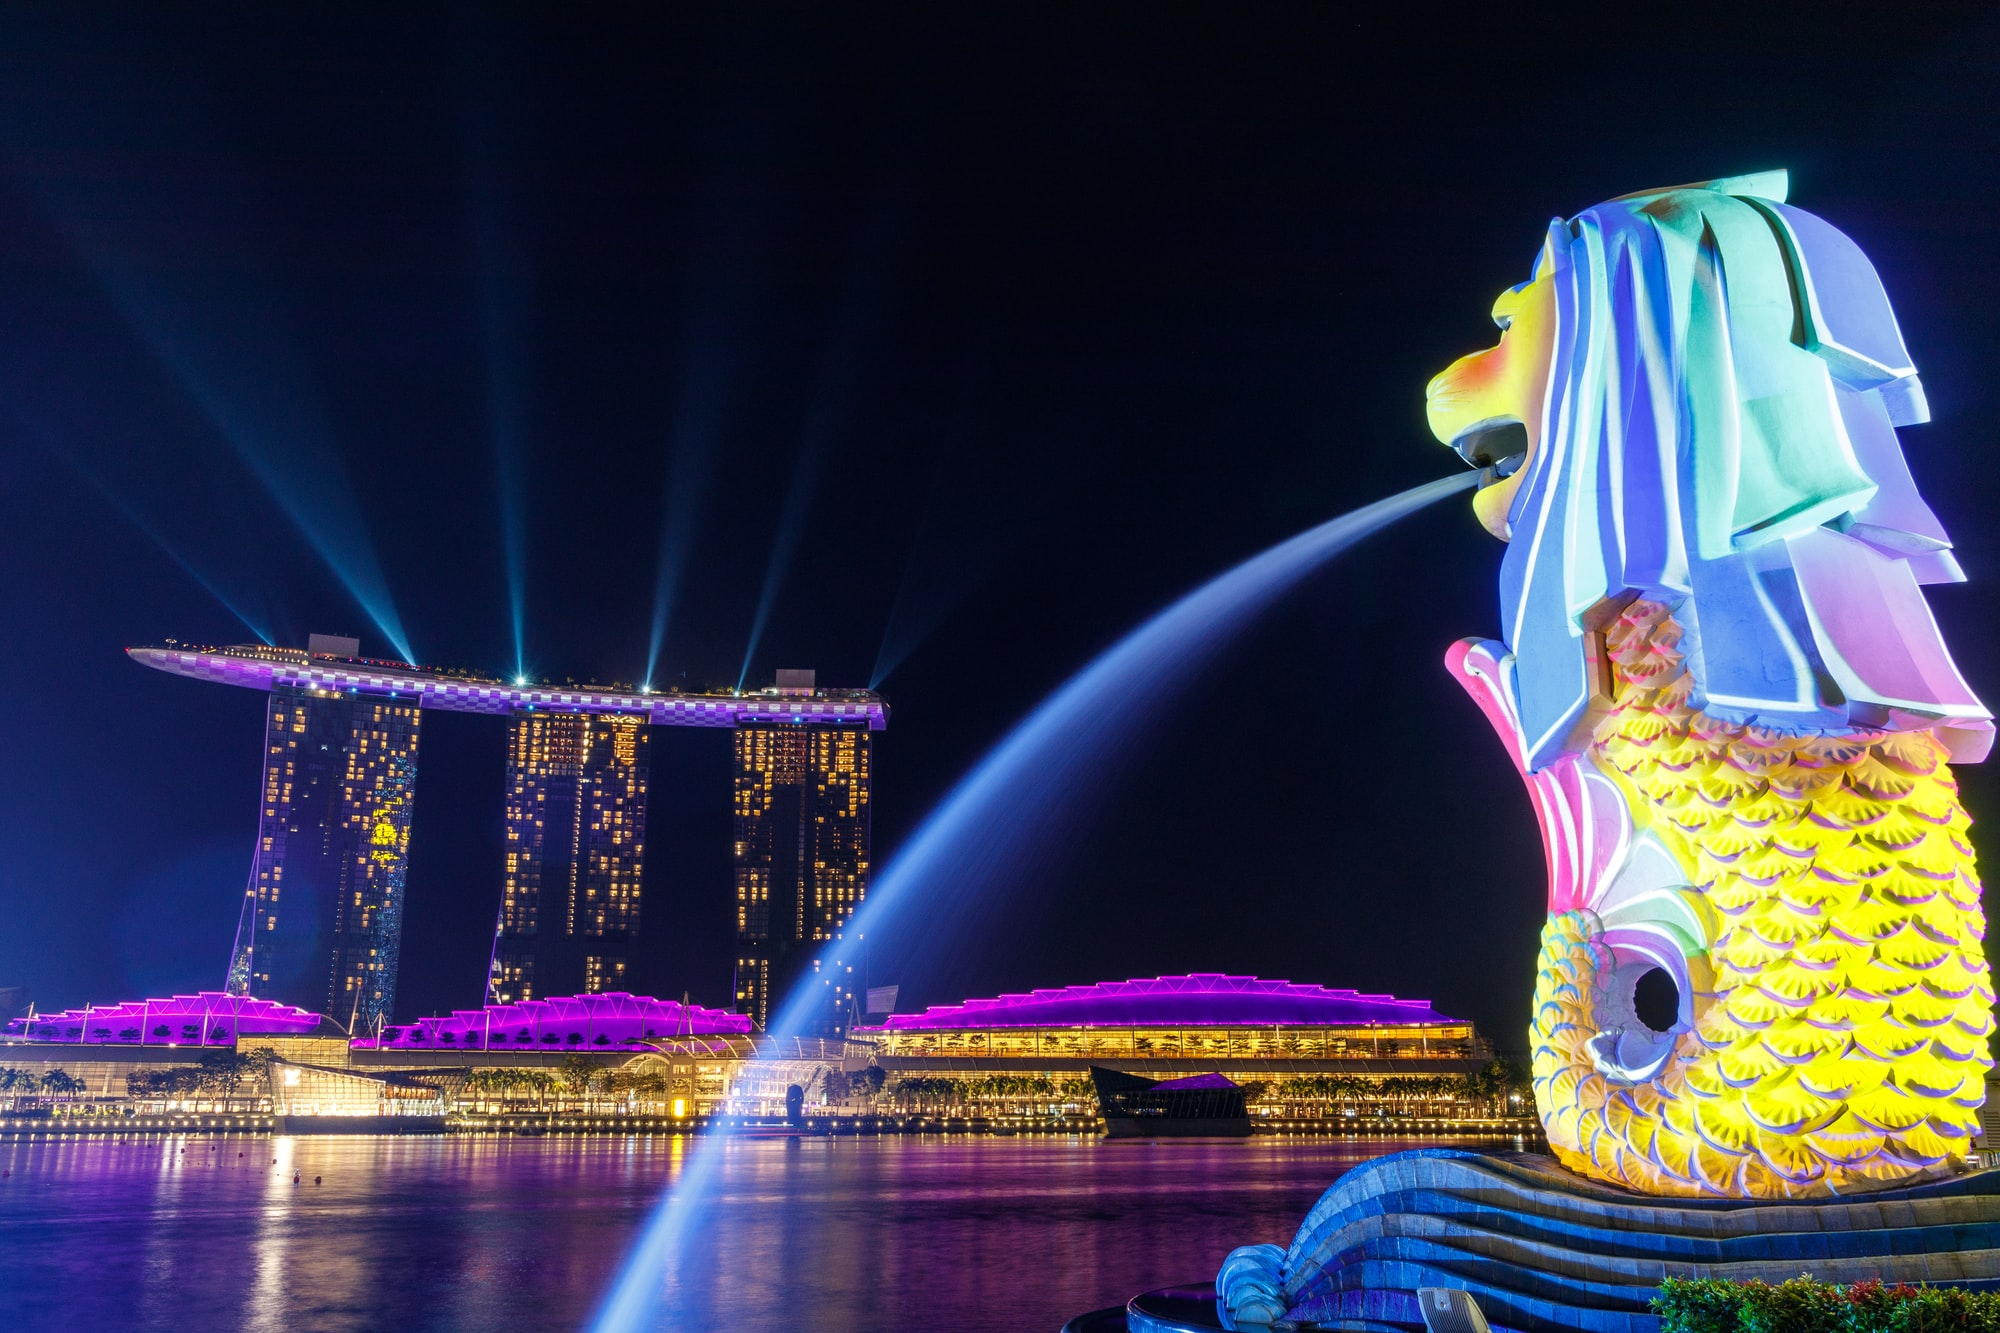 Grants, incubators and accelerators in Indonesia, Malaysia and Singapore